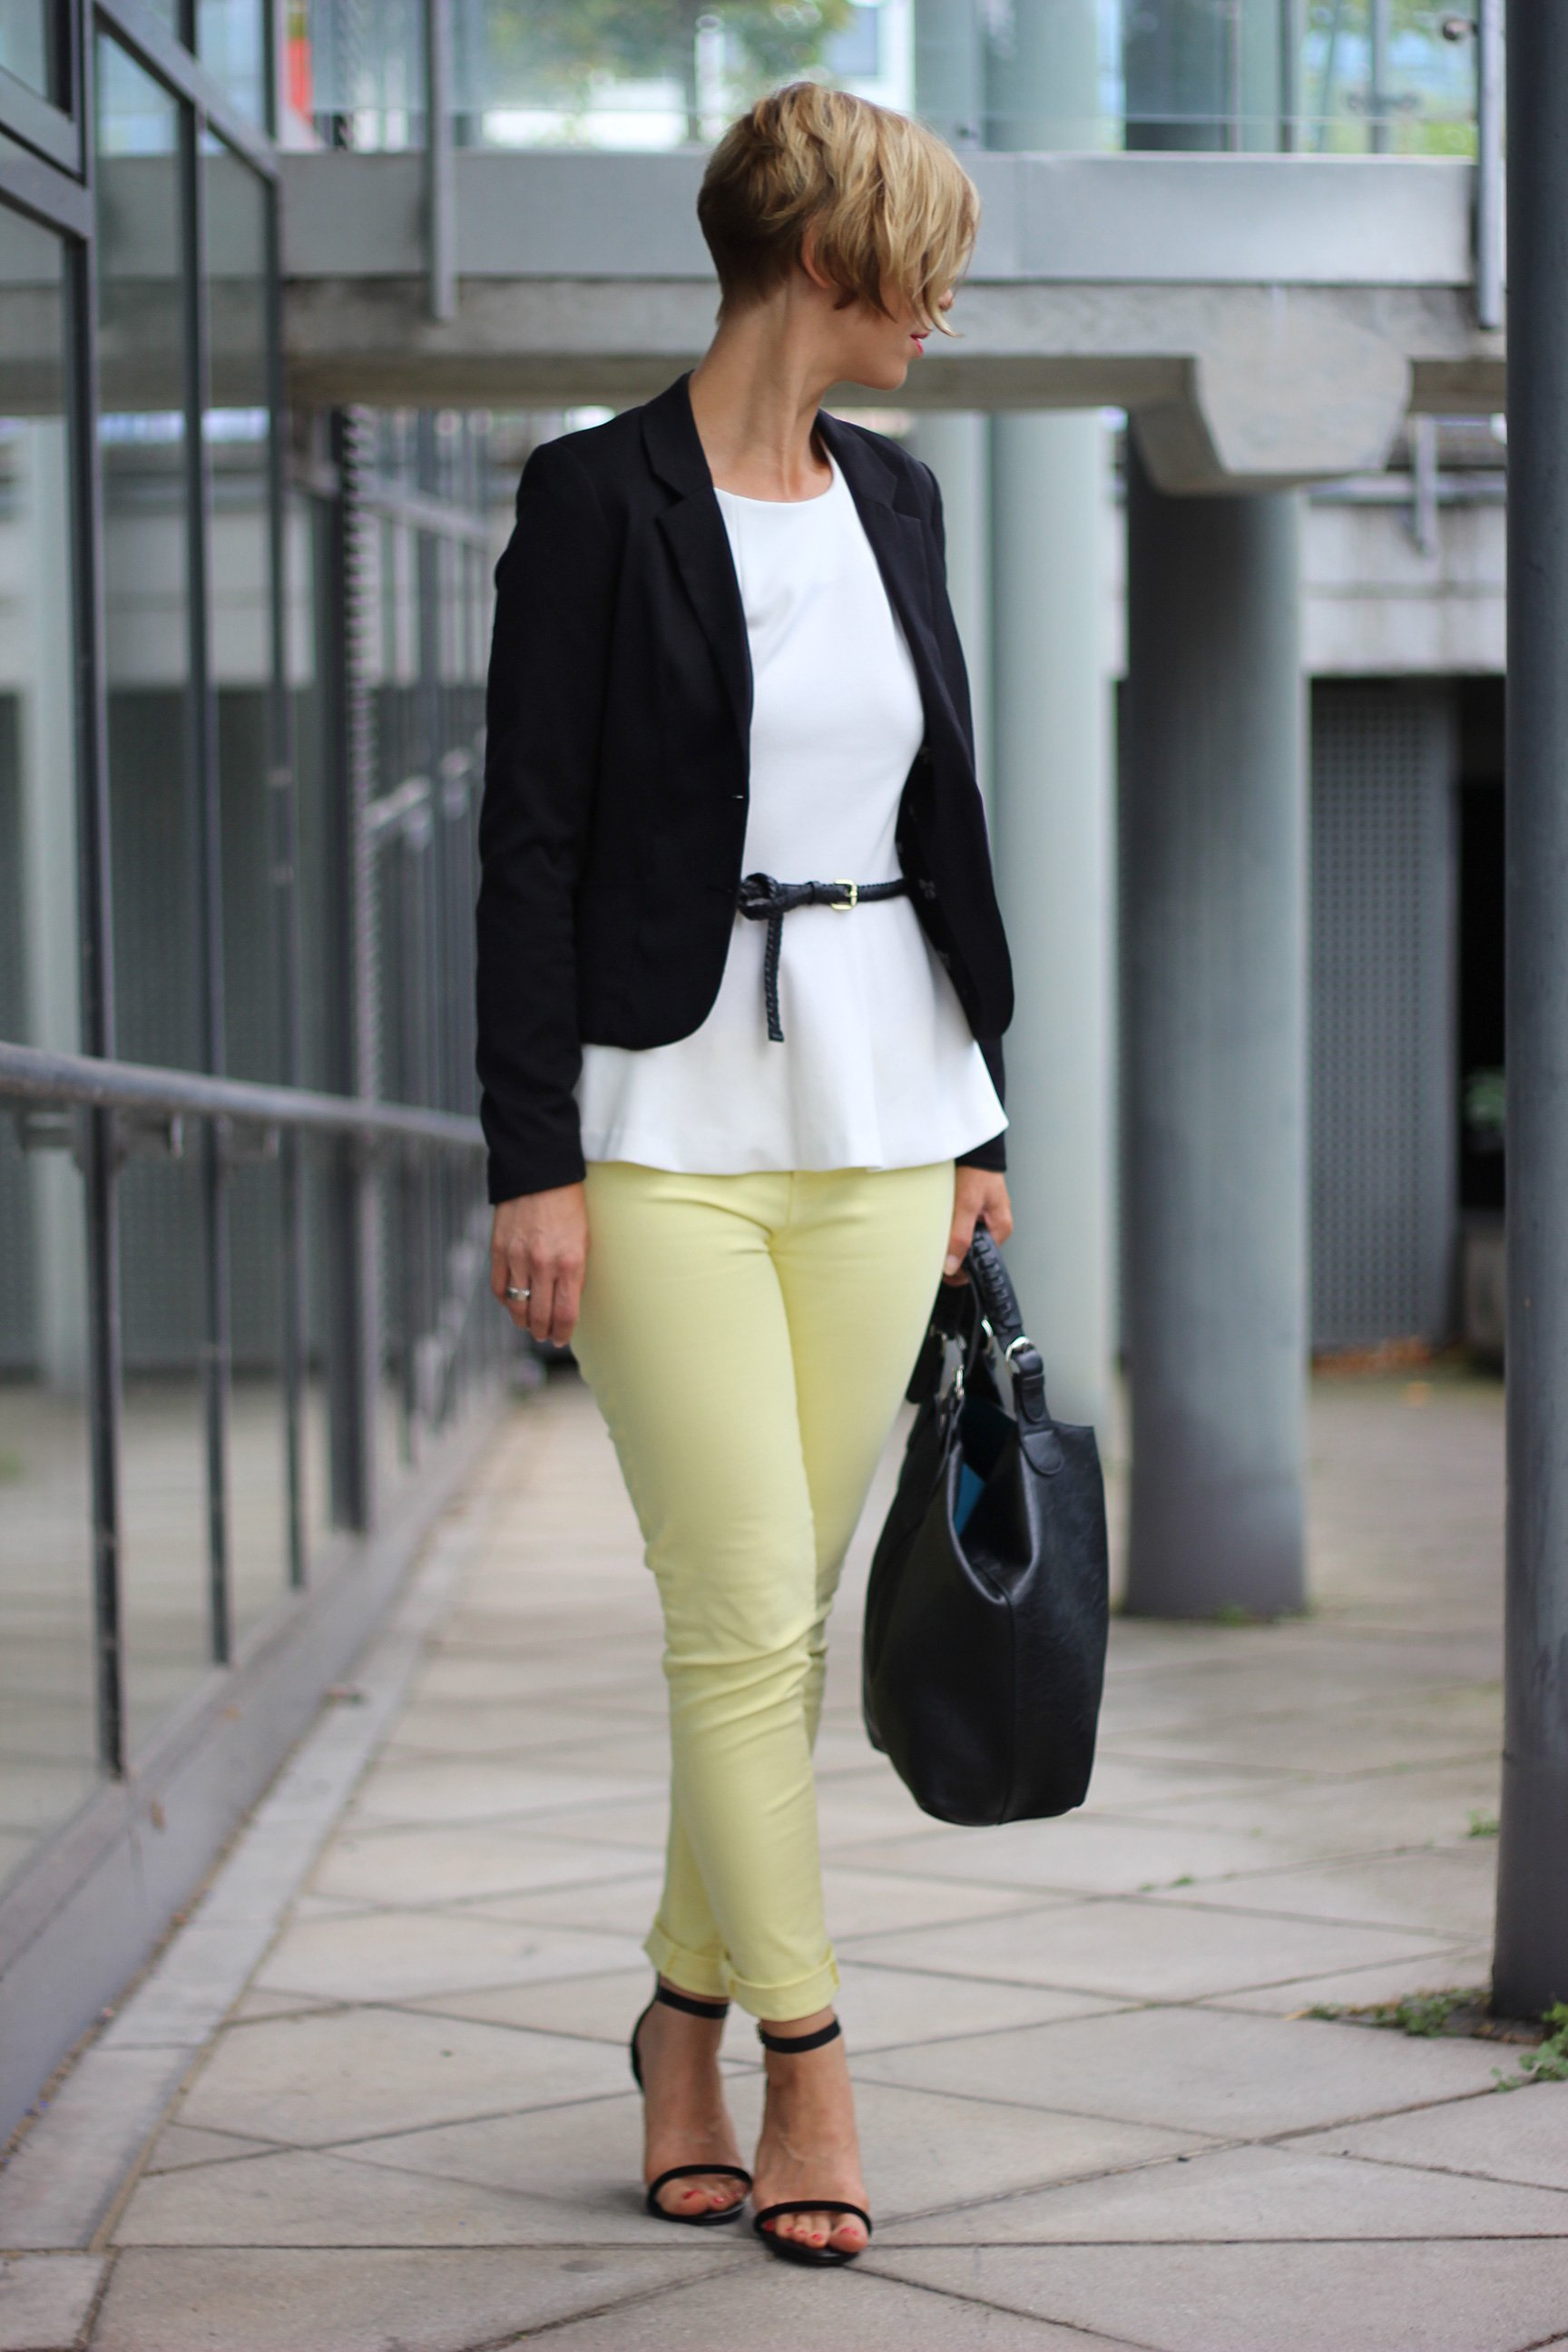 IMG_0101a_JBrand_gelbeJeans_yellow_Peplum_Mango_H&M_blazer_Sandaletten_blackwhite_schwarzweiß_Conny_AHemadundaHos